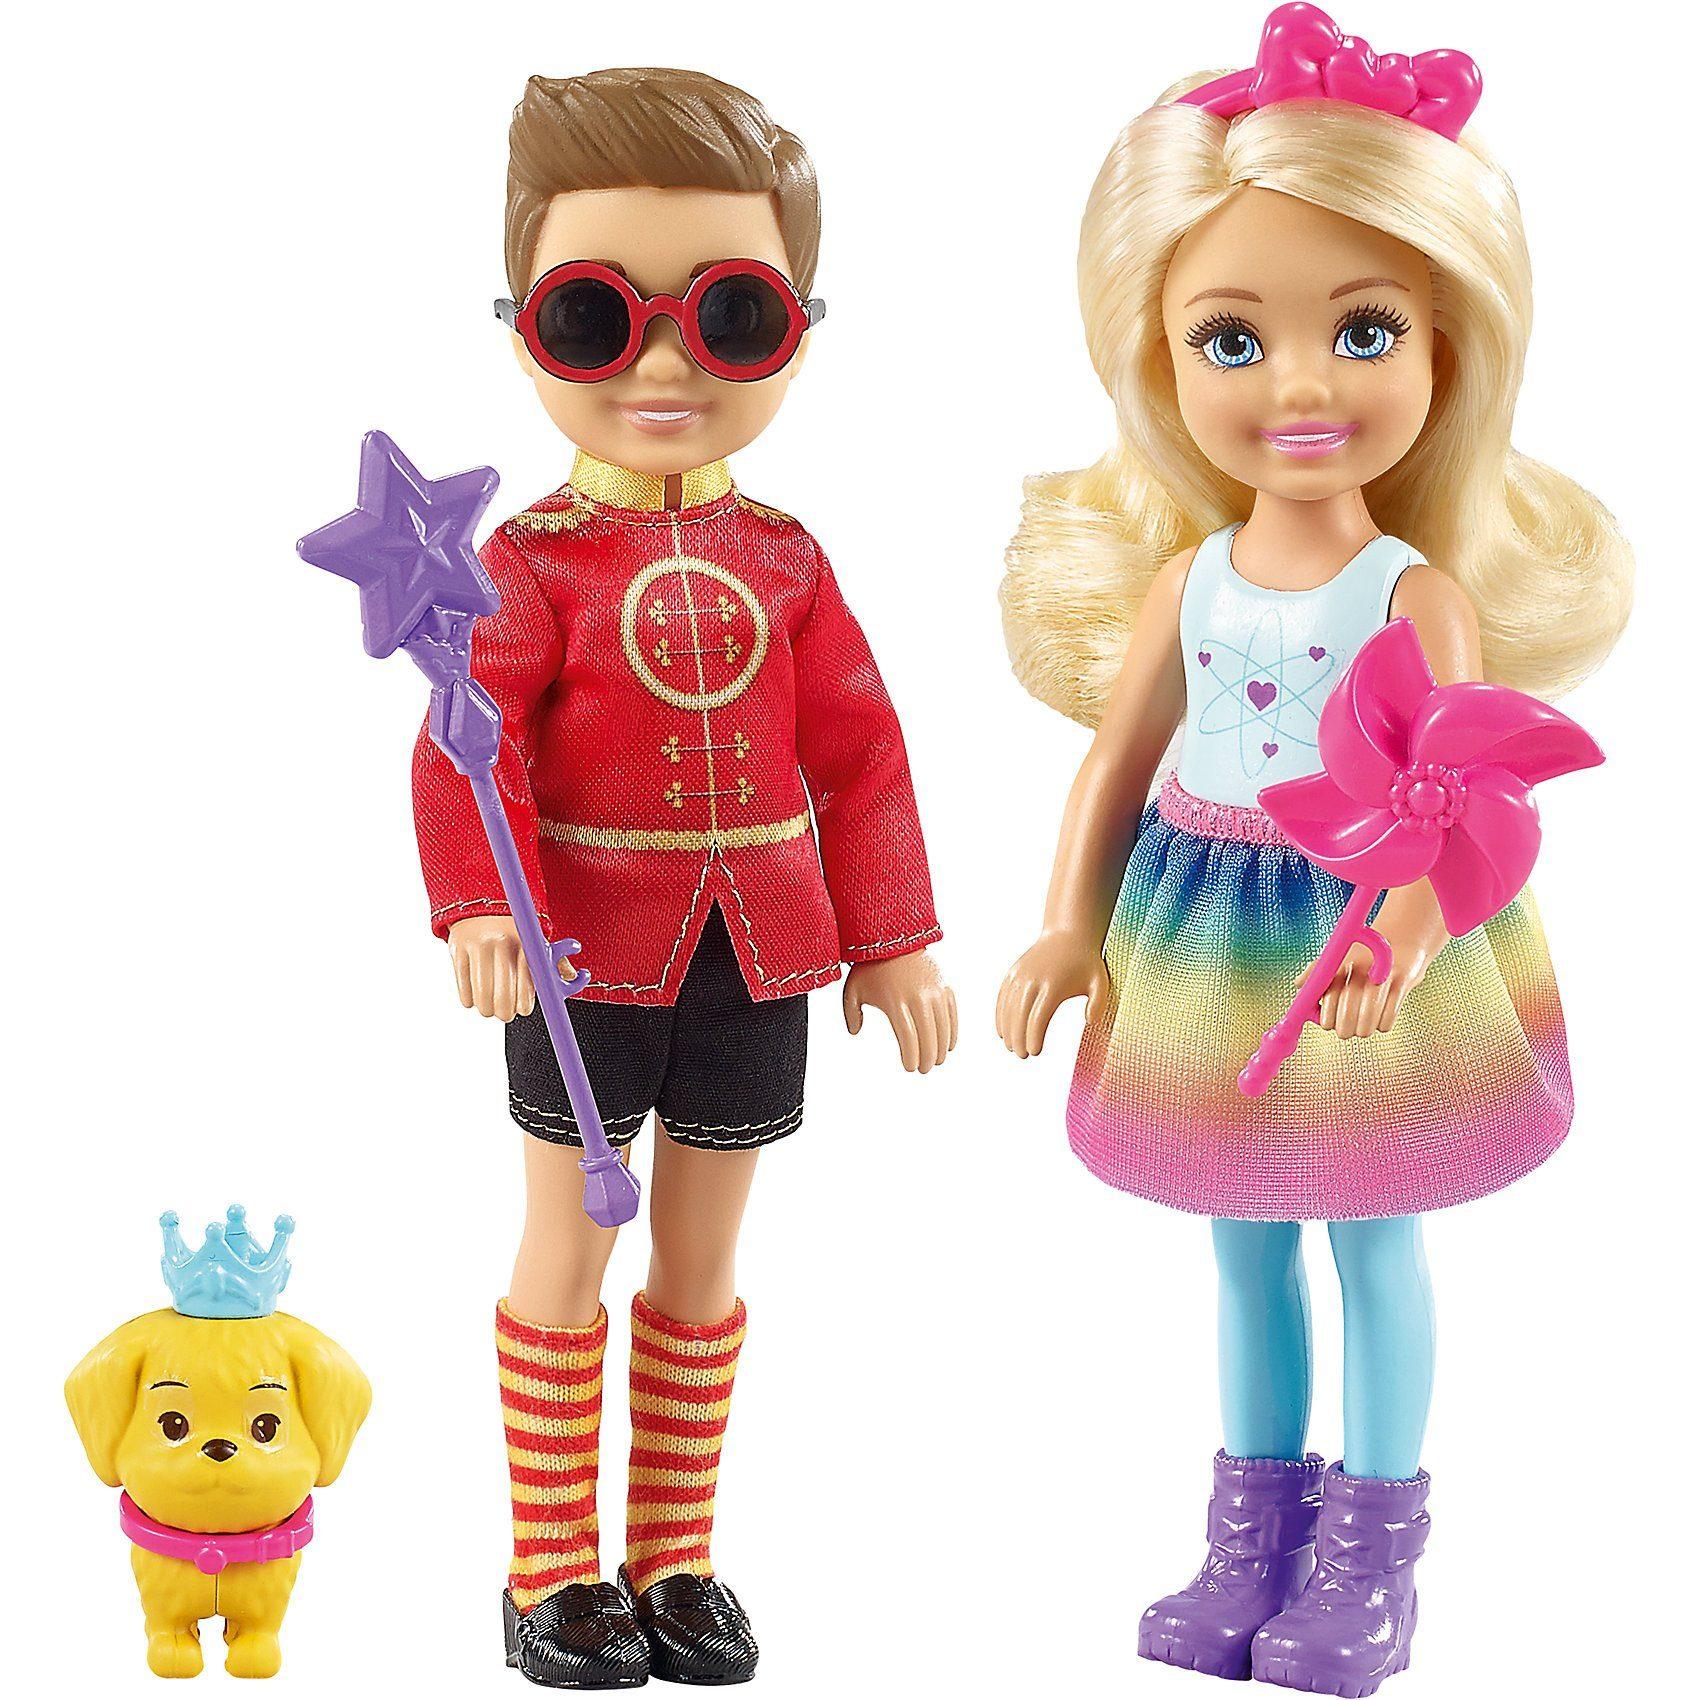 Mattel® Barbie Dreamtopia Chelsea und Prinz Otto Puppenset